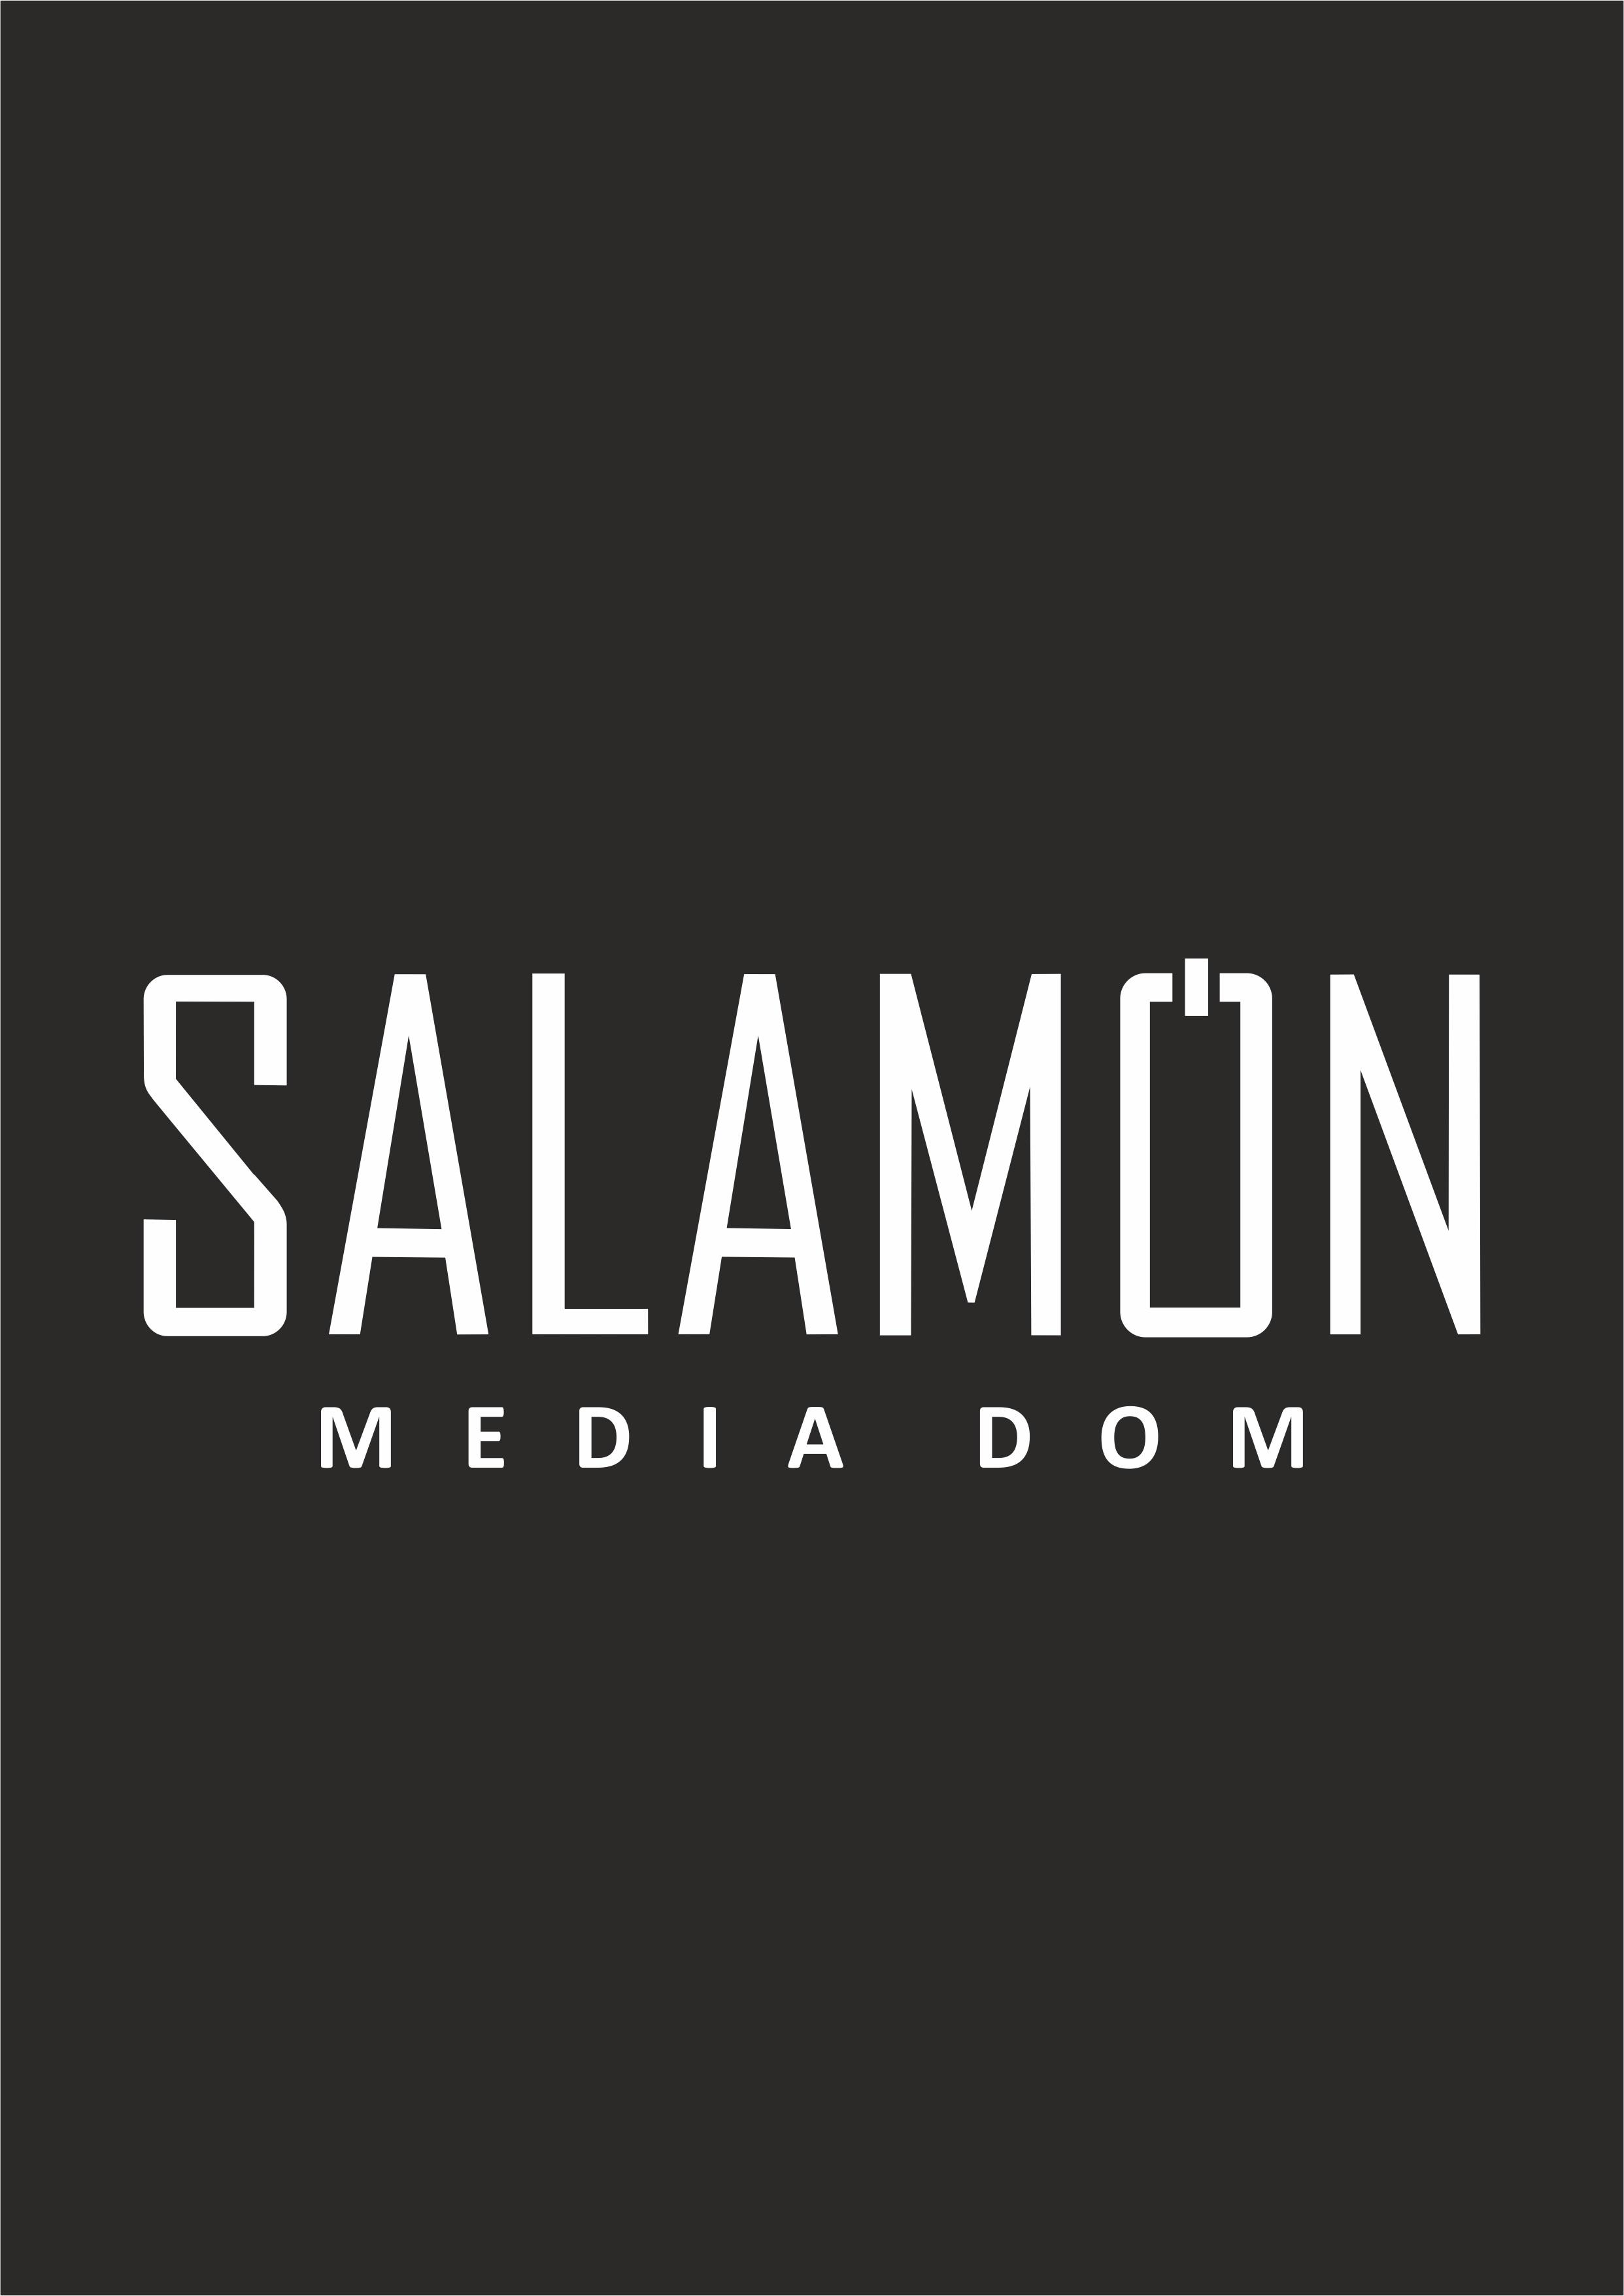 """SALAMON Media Dom"""